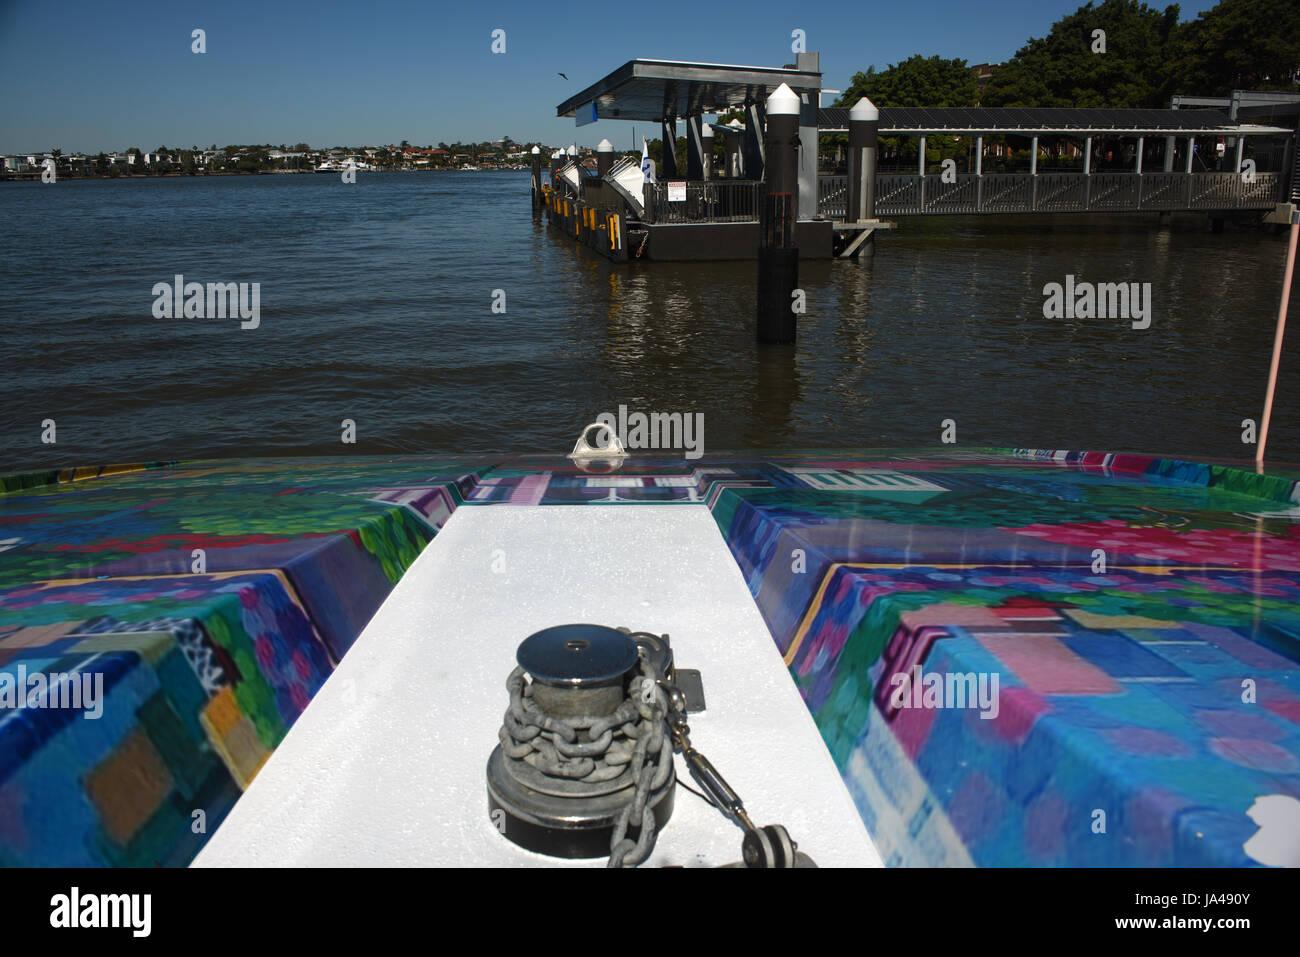 Brisbane, Australia: CityCat ferry approaches Teneriffe wharf on the Brisbane River - Stock Image